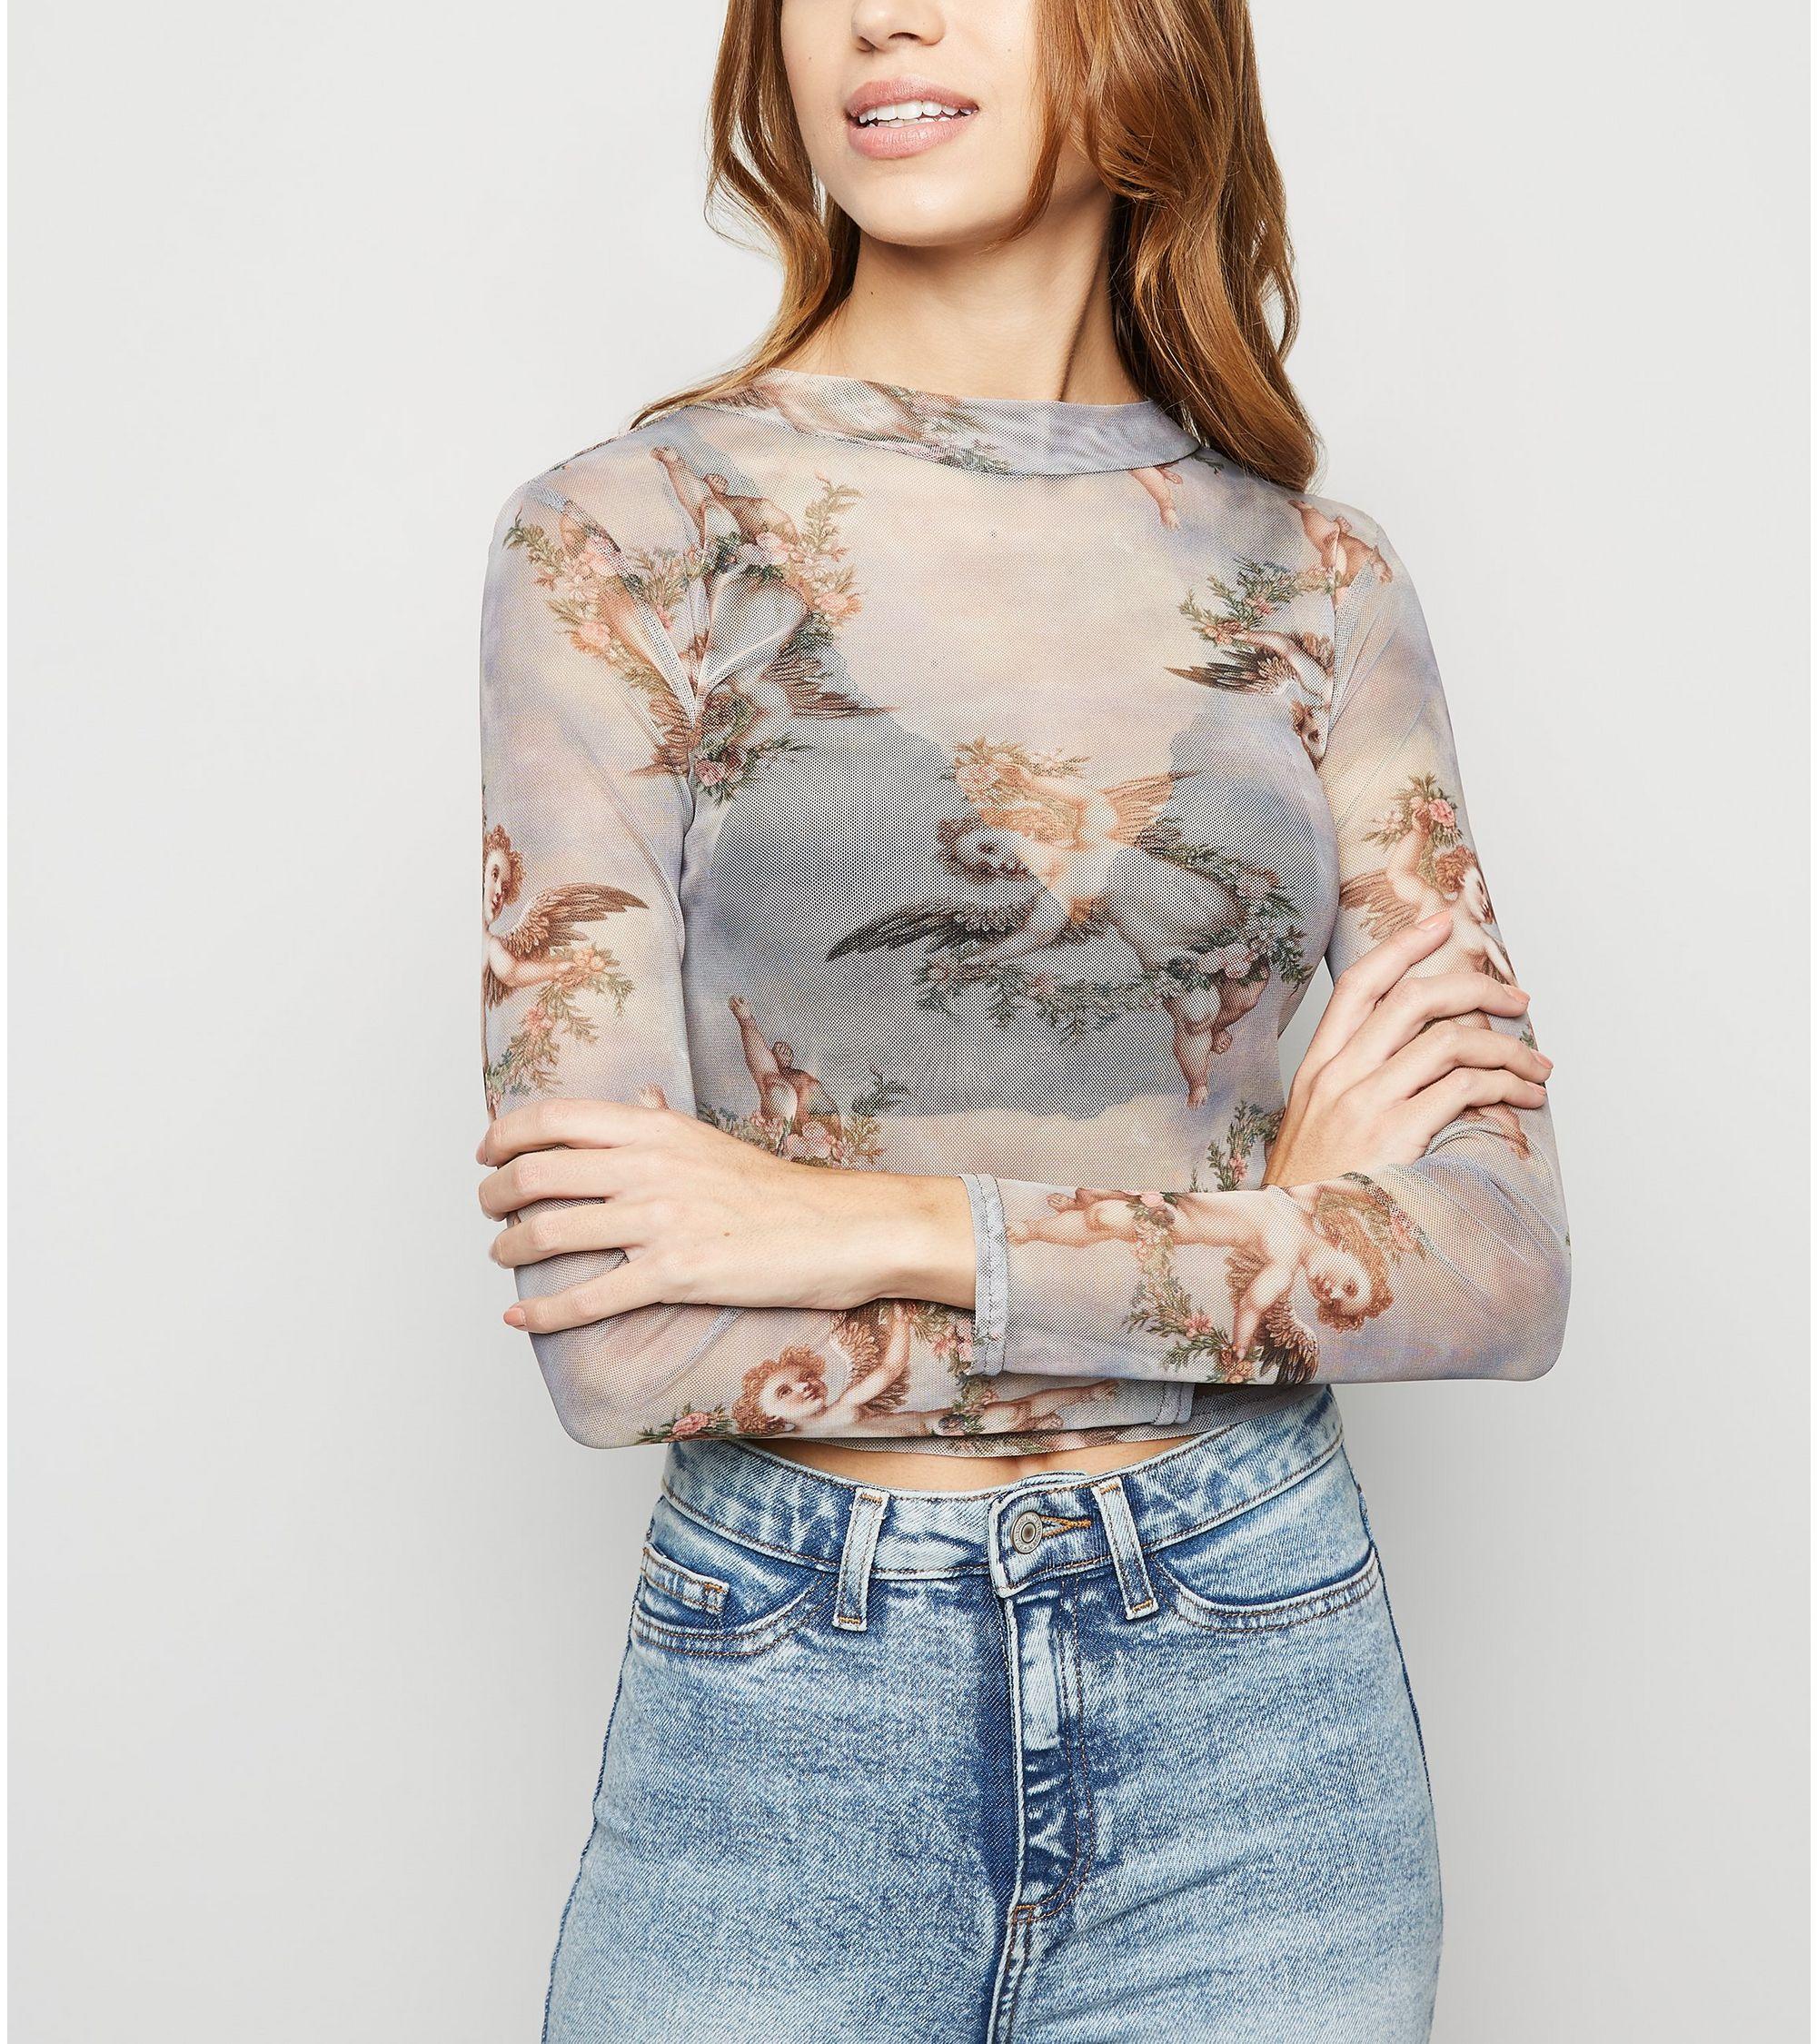 4c7427e2aa9b0 New Look cherub floral print mesh top at £12.99 | love the brands